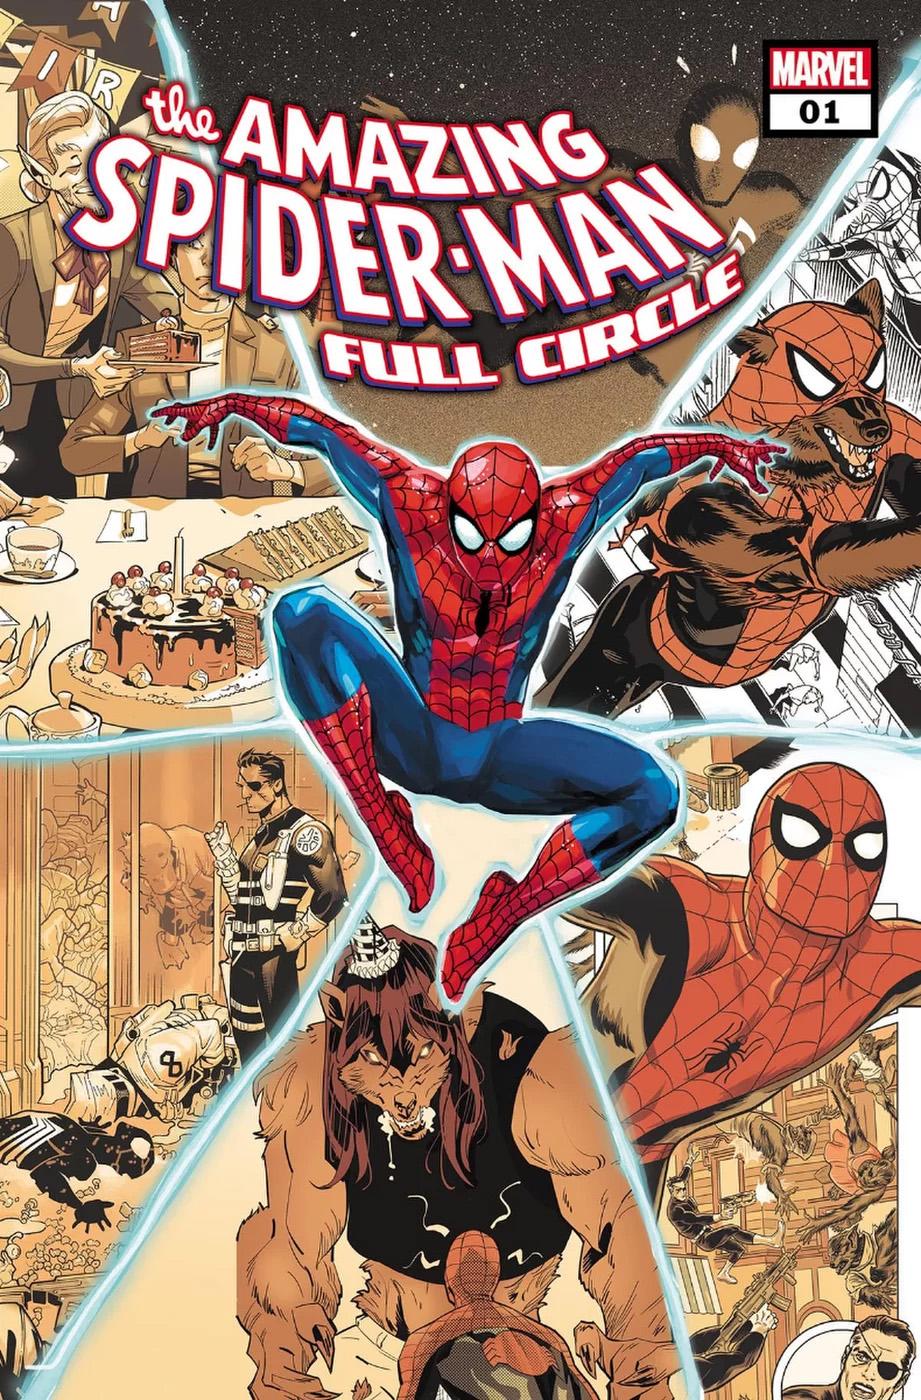 MARVEL E DC COMICS - Pagina 9 Smfoc-10